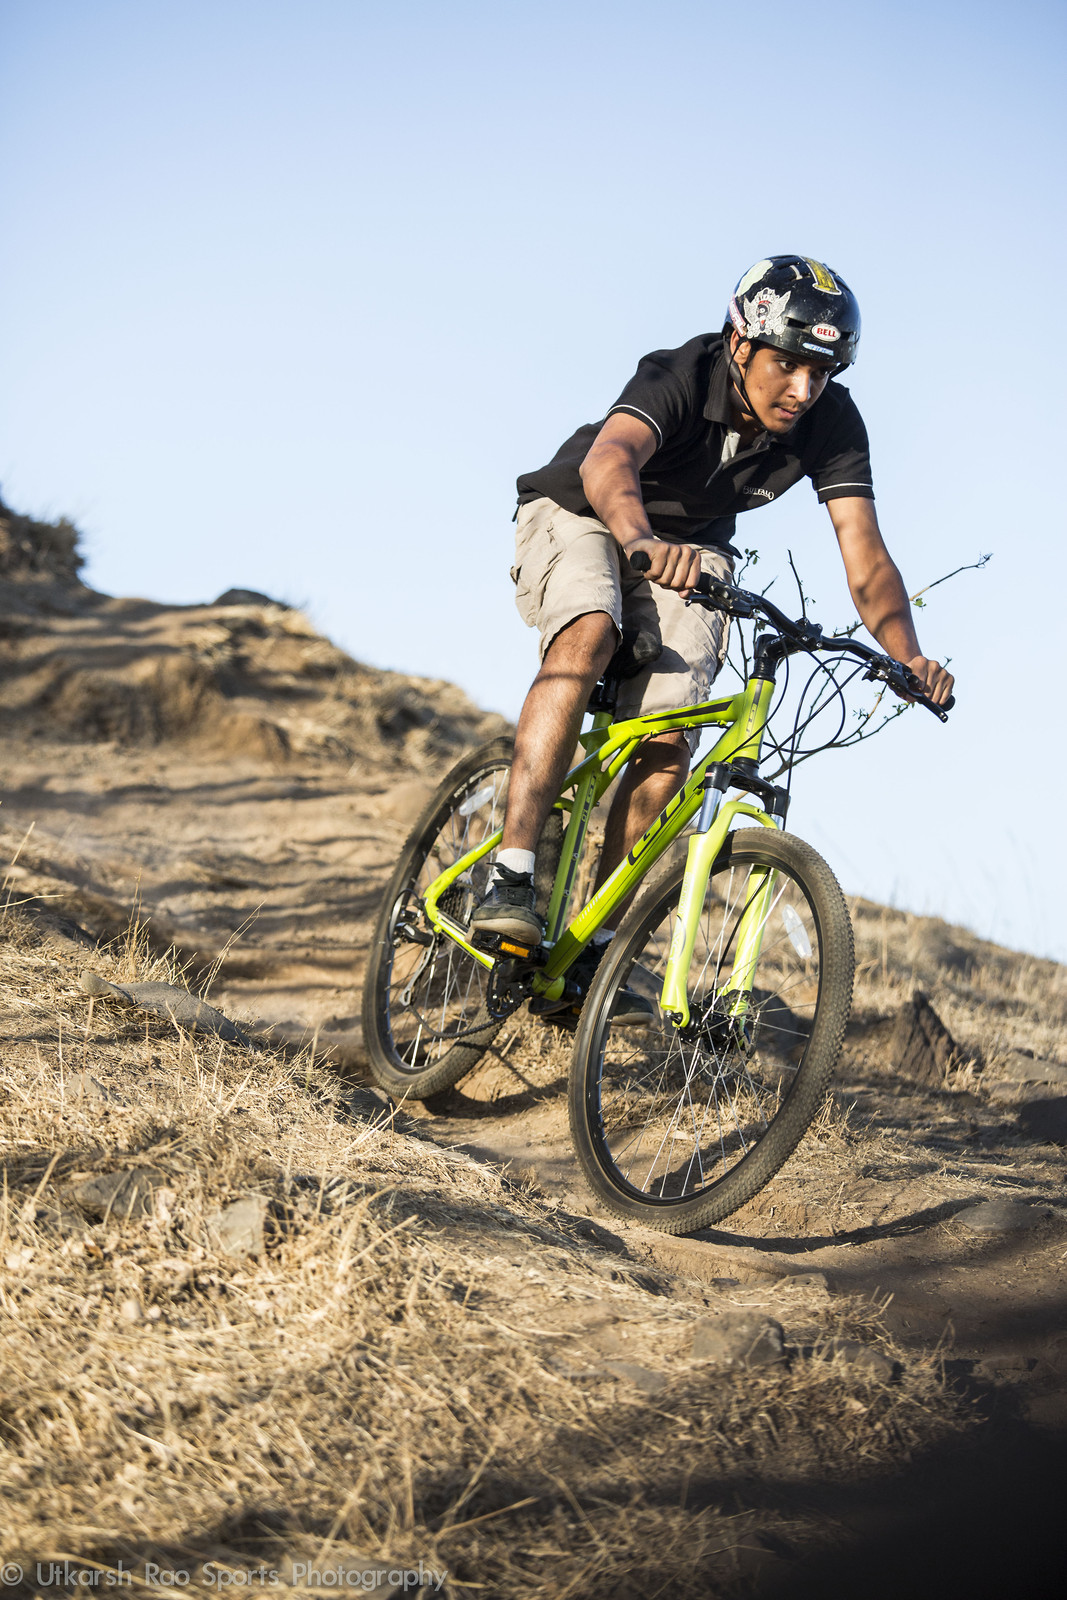 H1B1274 - utkarsh rao - Mountain Biking Pictures - Vital MTB